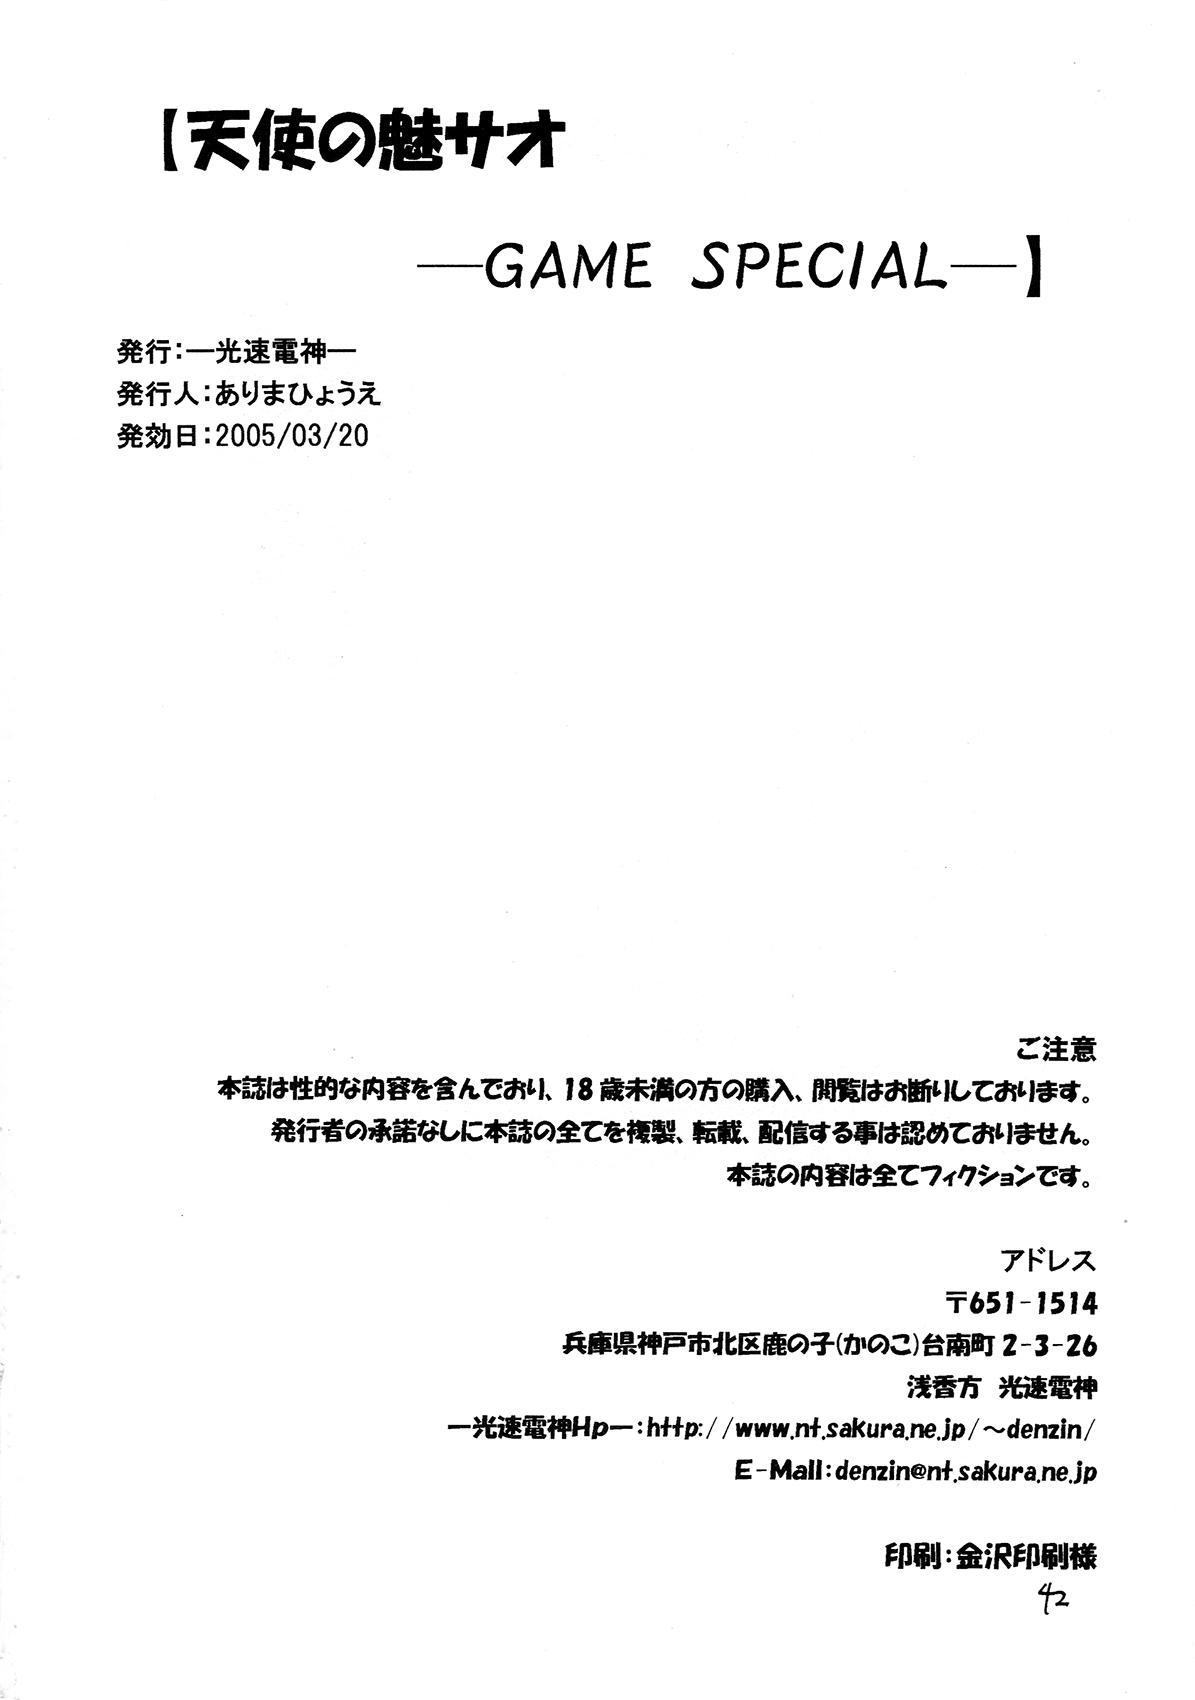 Tenshi no Misao Game Special 41